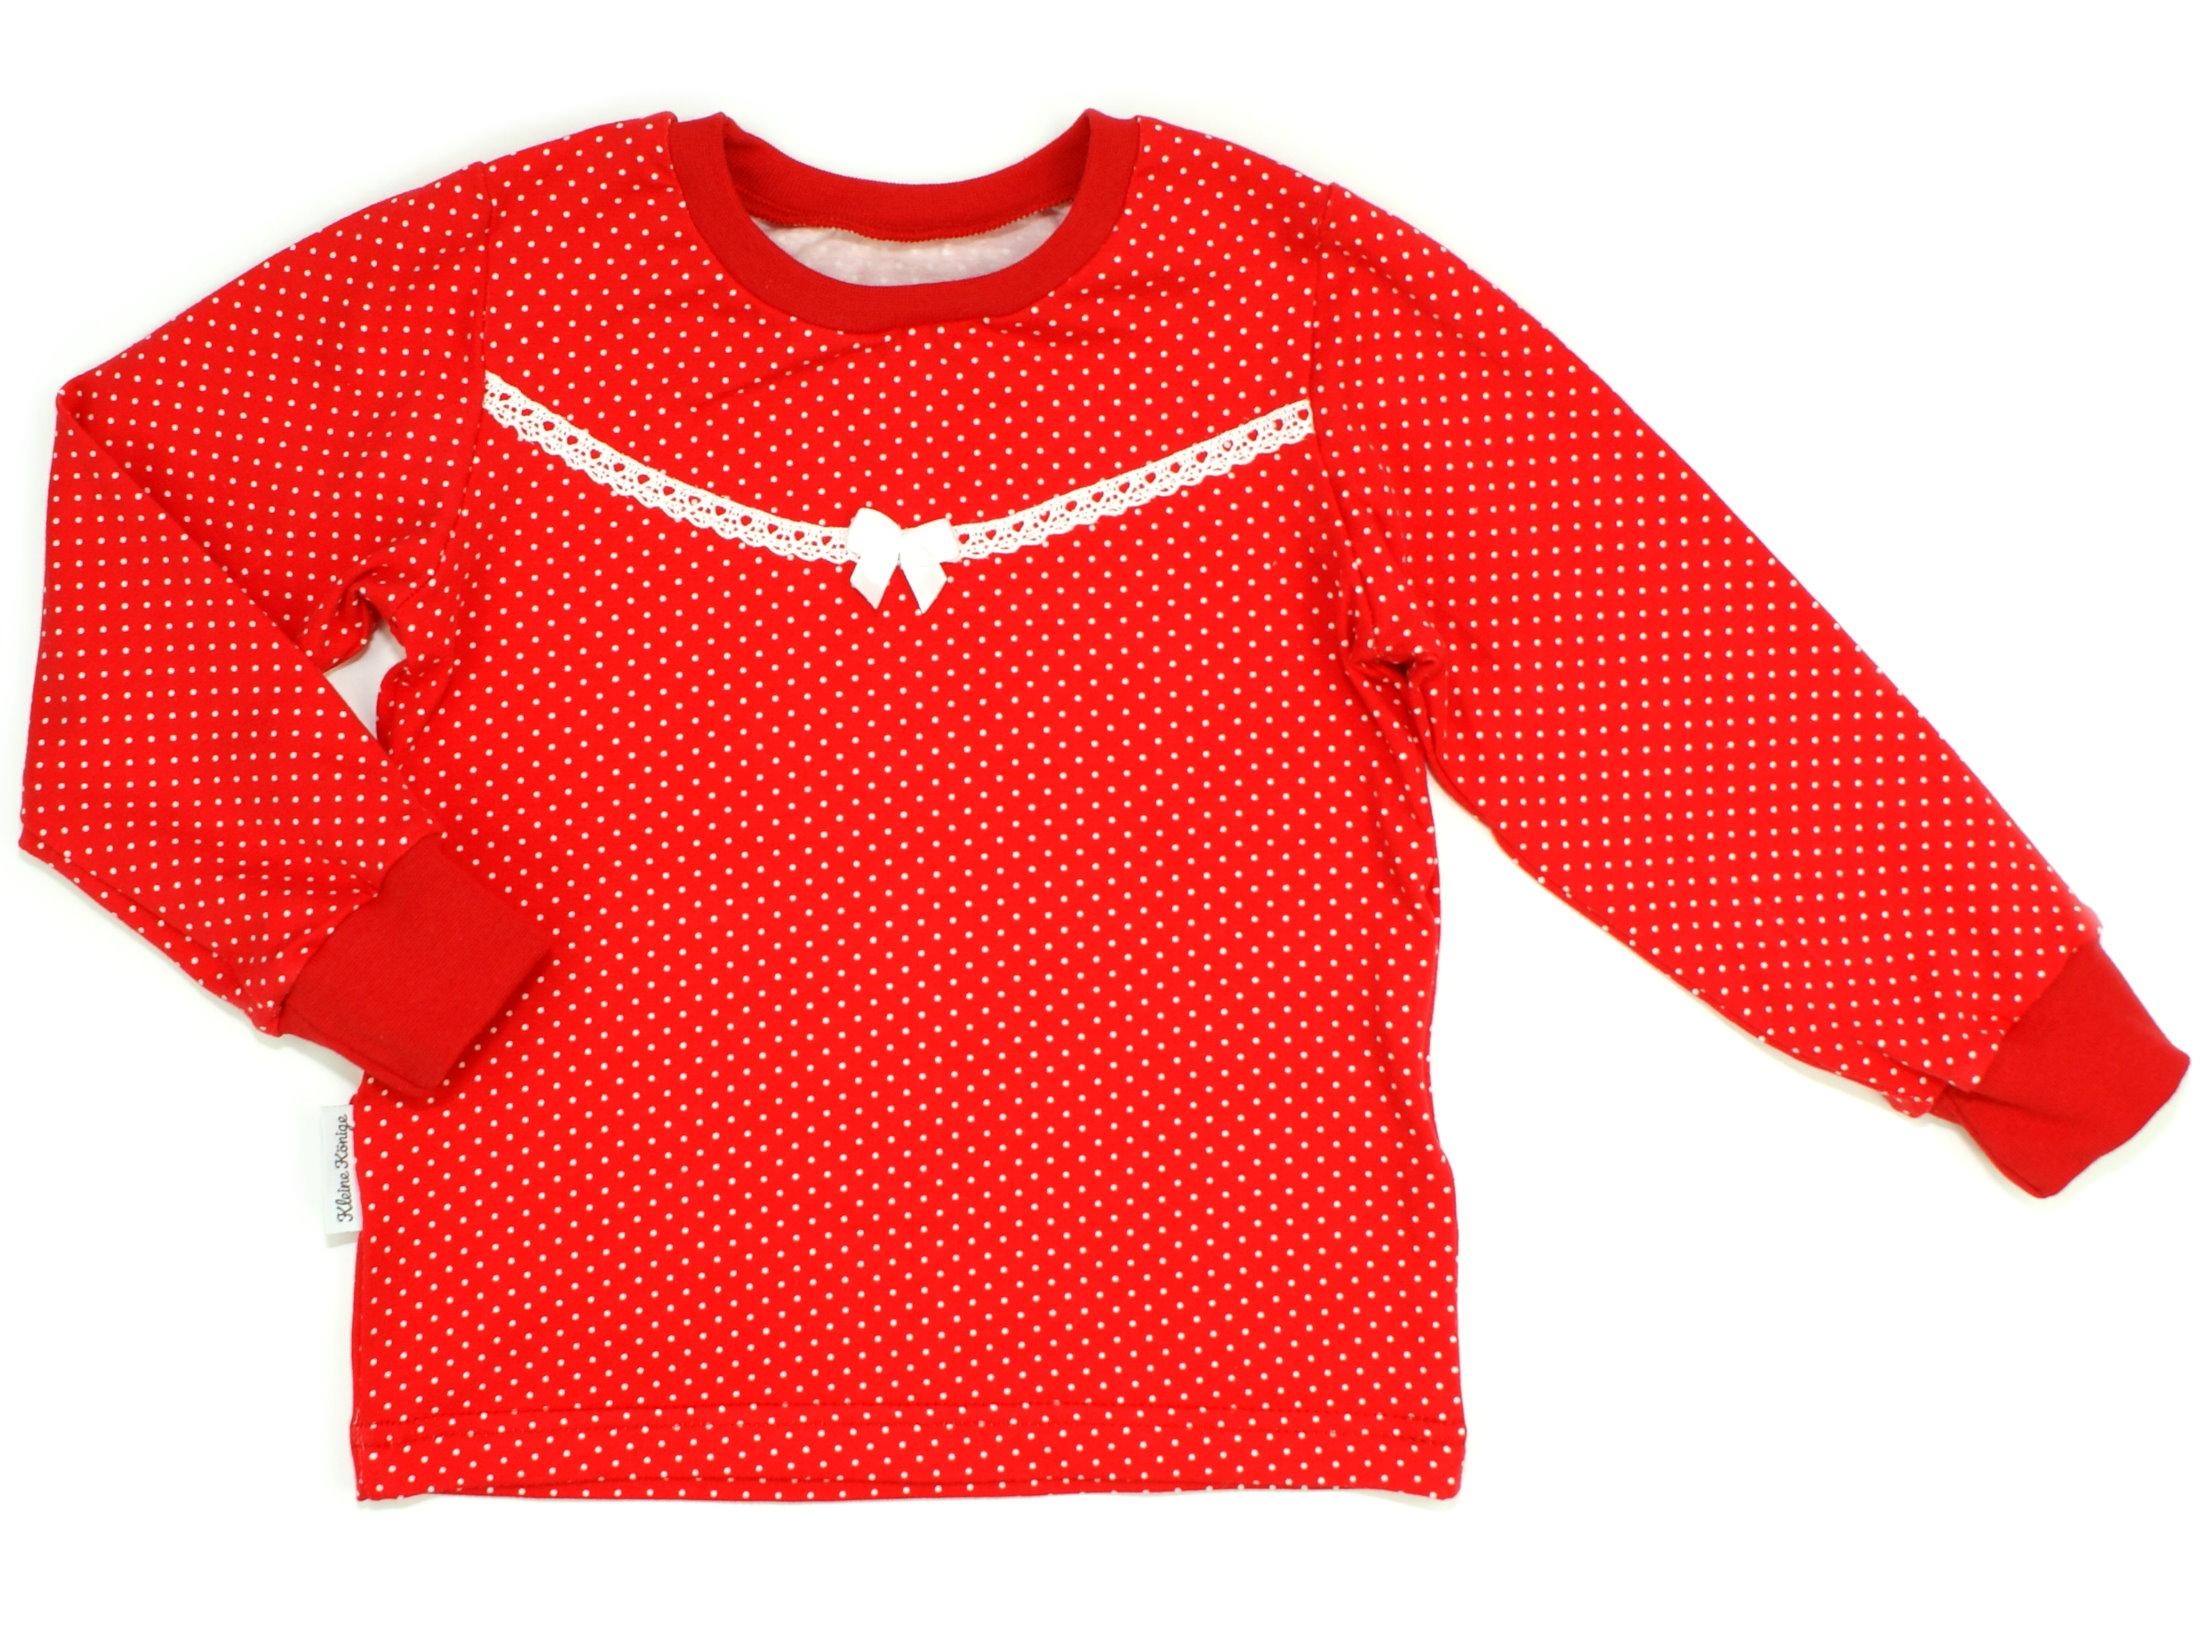 "Kinder Langarmshirt ""Punkte"" rot weiß"